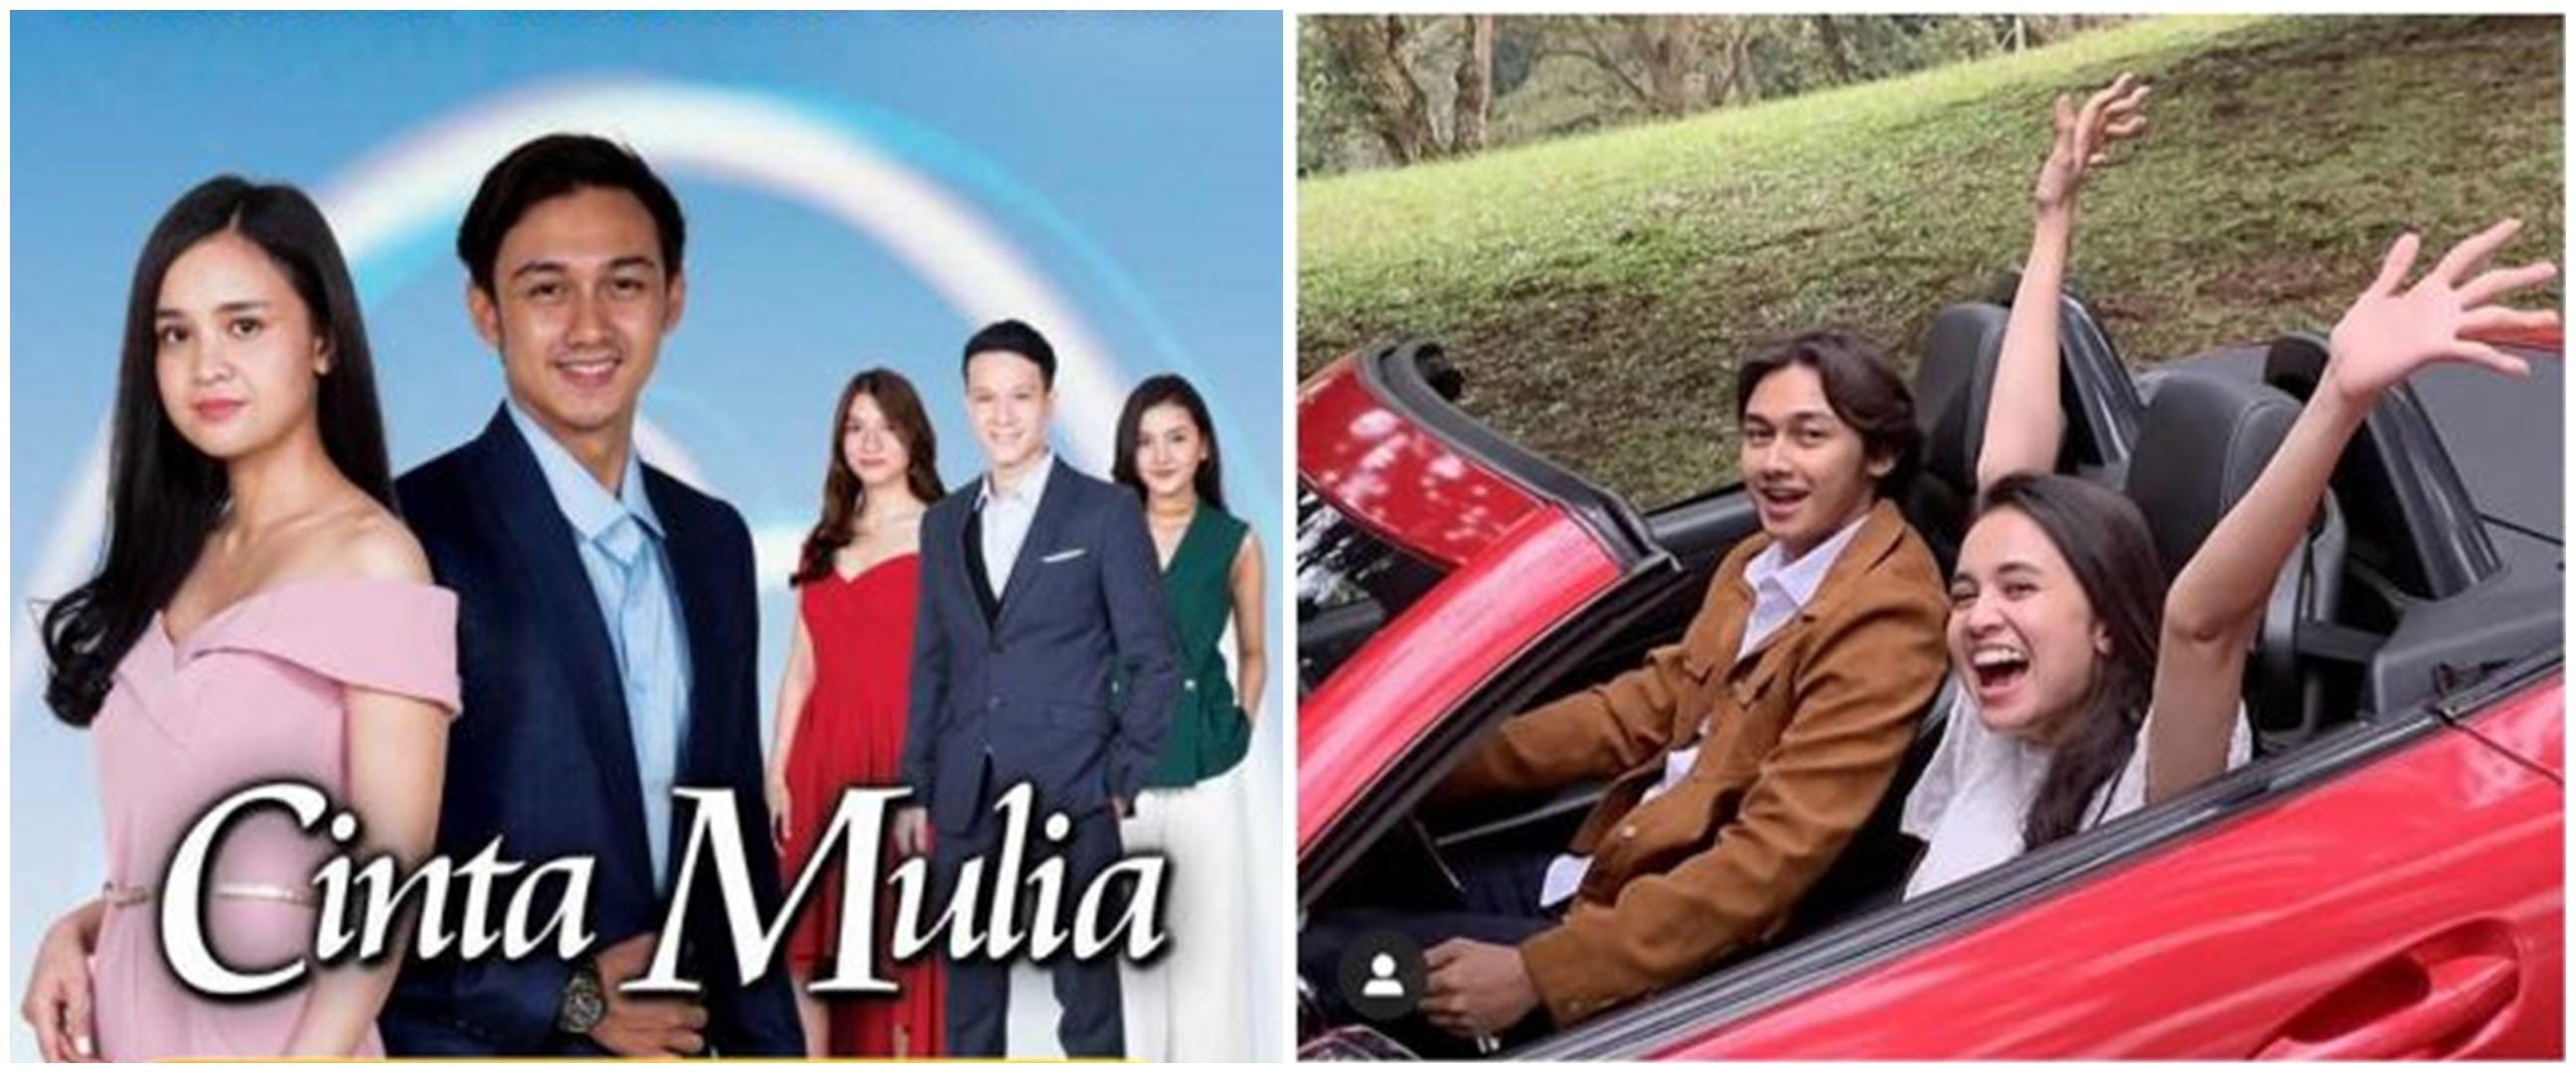 Potret awal karier 6 pemain sinetron Cinta Mulia, Hito bikin pangling